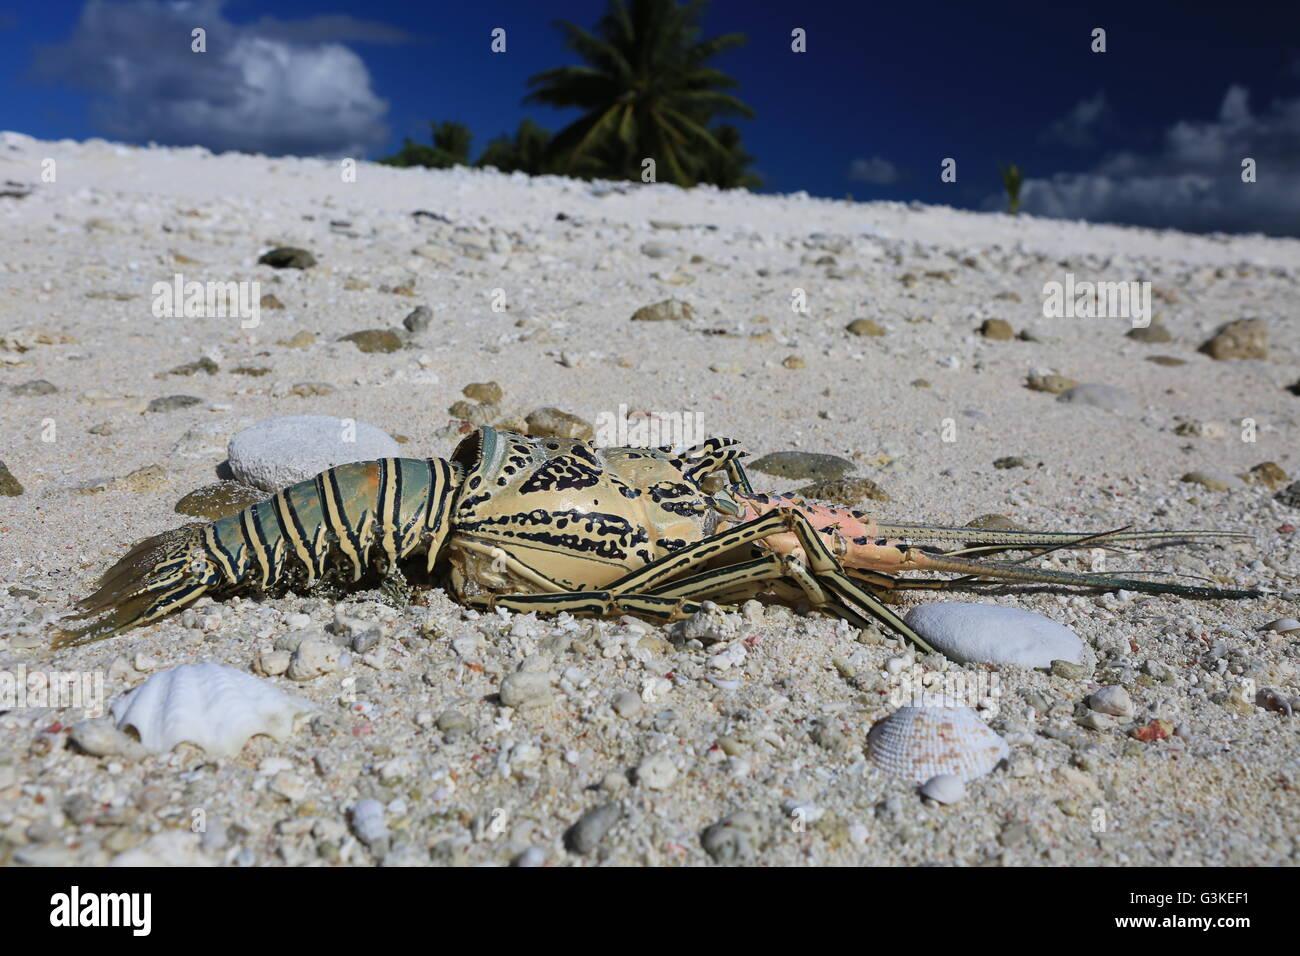 Lobster shell on a sandy beach, Christmas Island, Kiribati - Stock Image